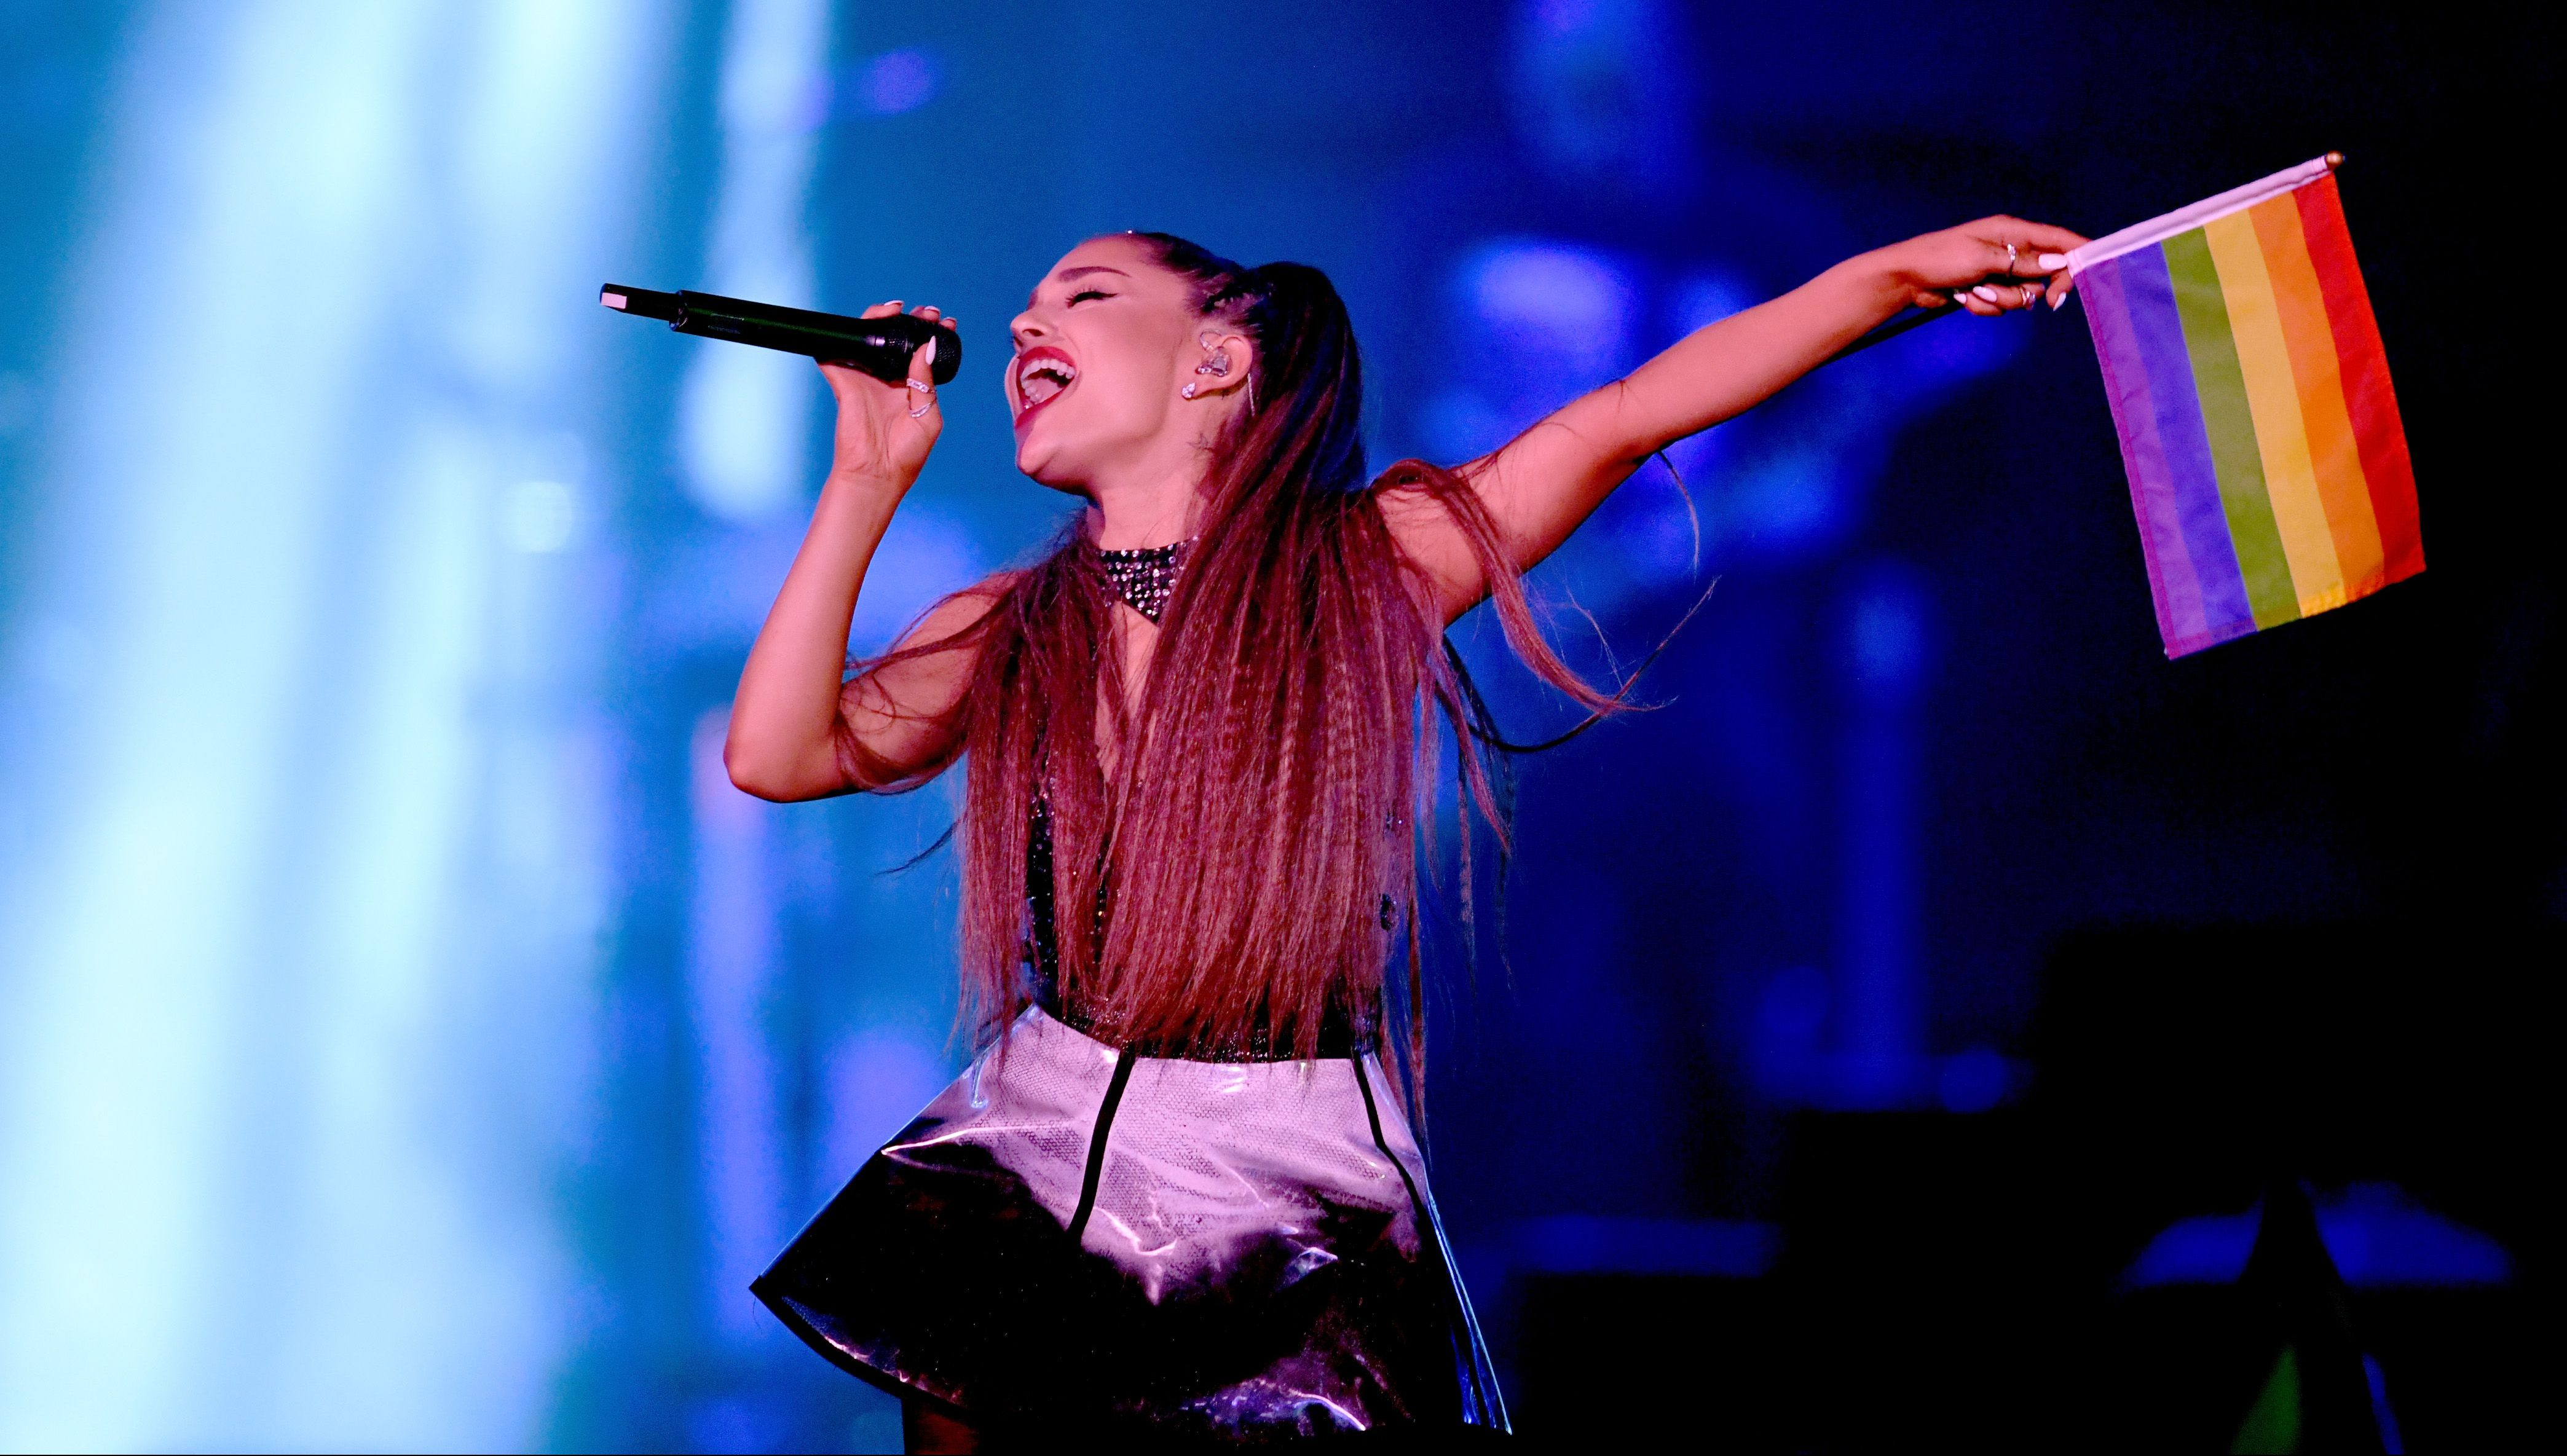 Ariana Grande Manchester Pride Festivali'nde Yer Alacak!